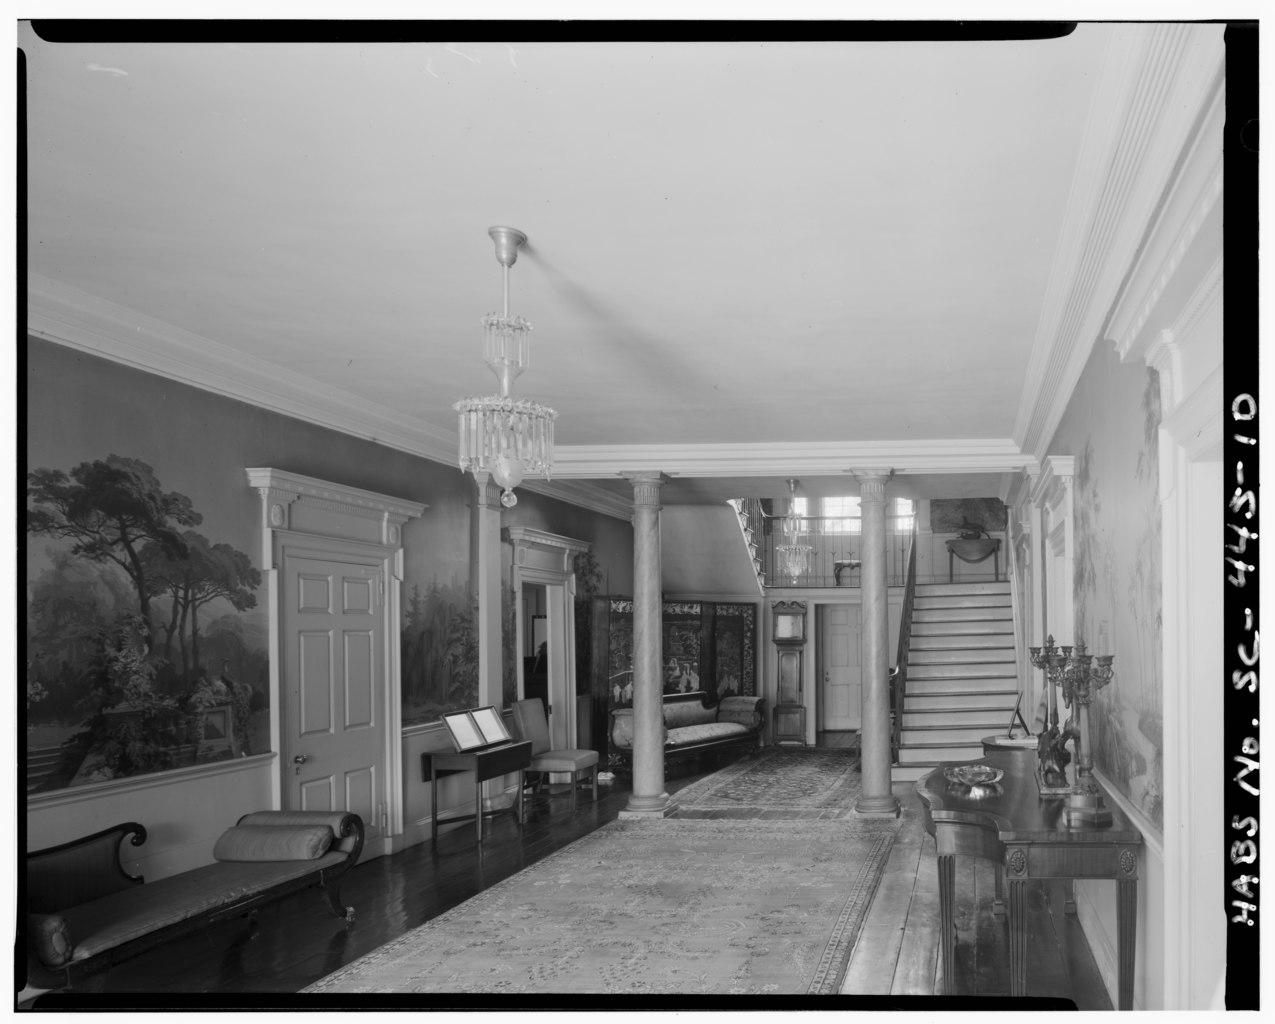 Flooring Services Charleston Sc : File hall first floor looking north toward rear door